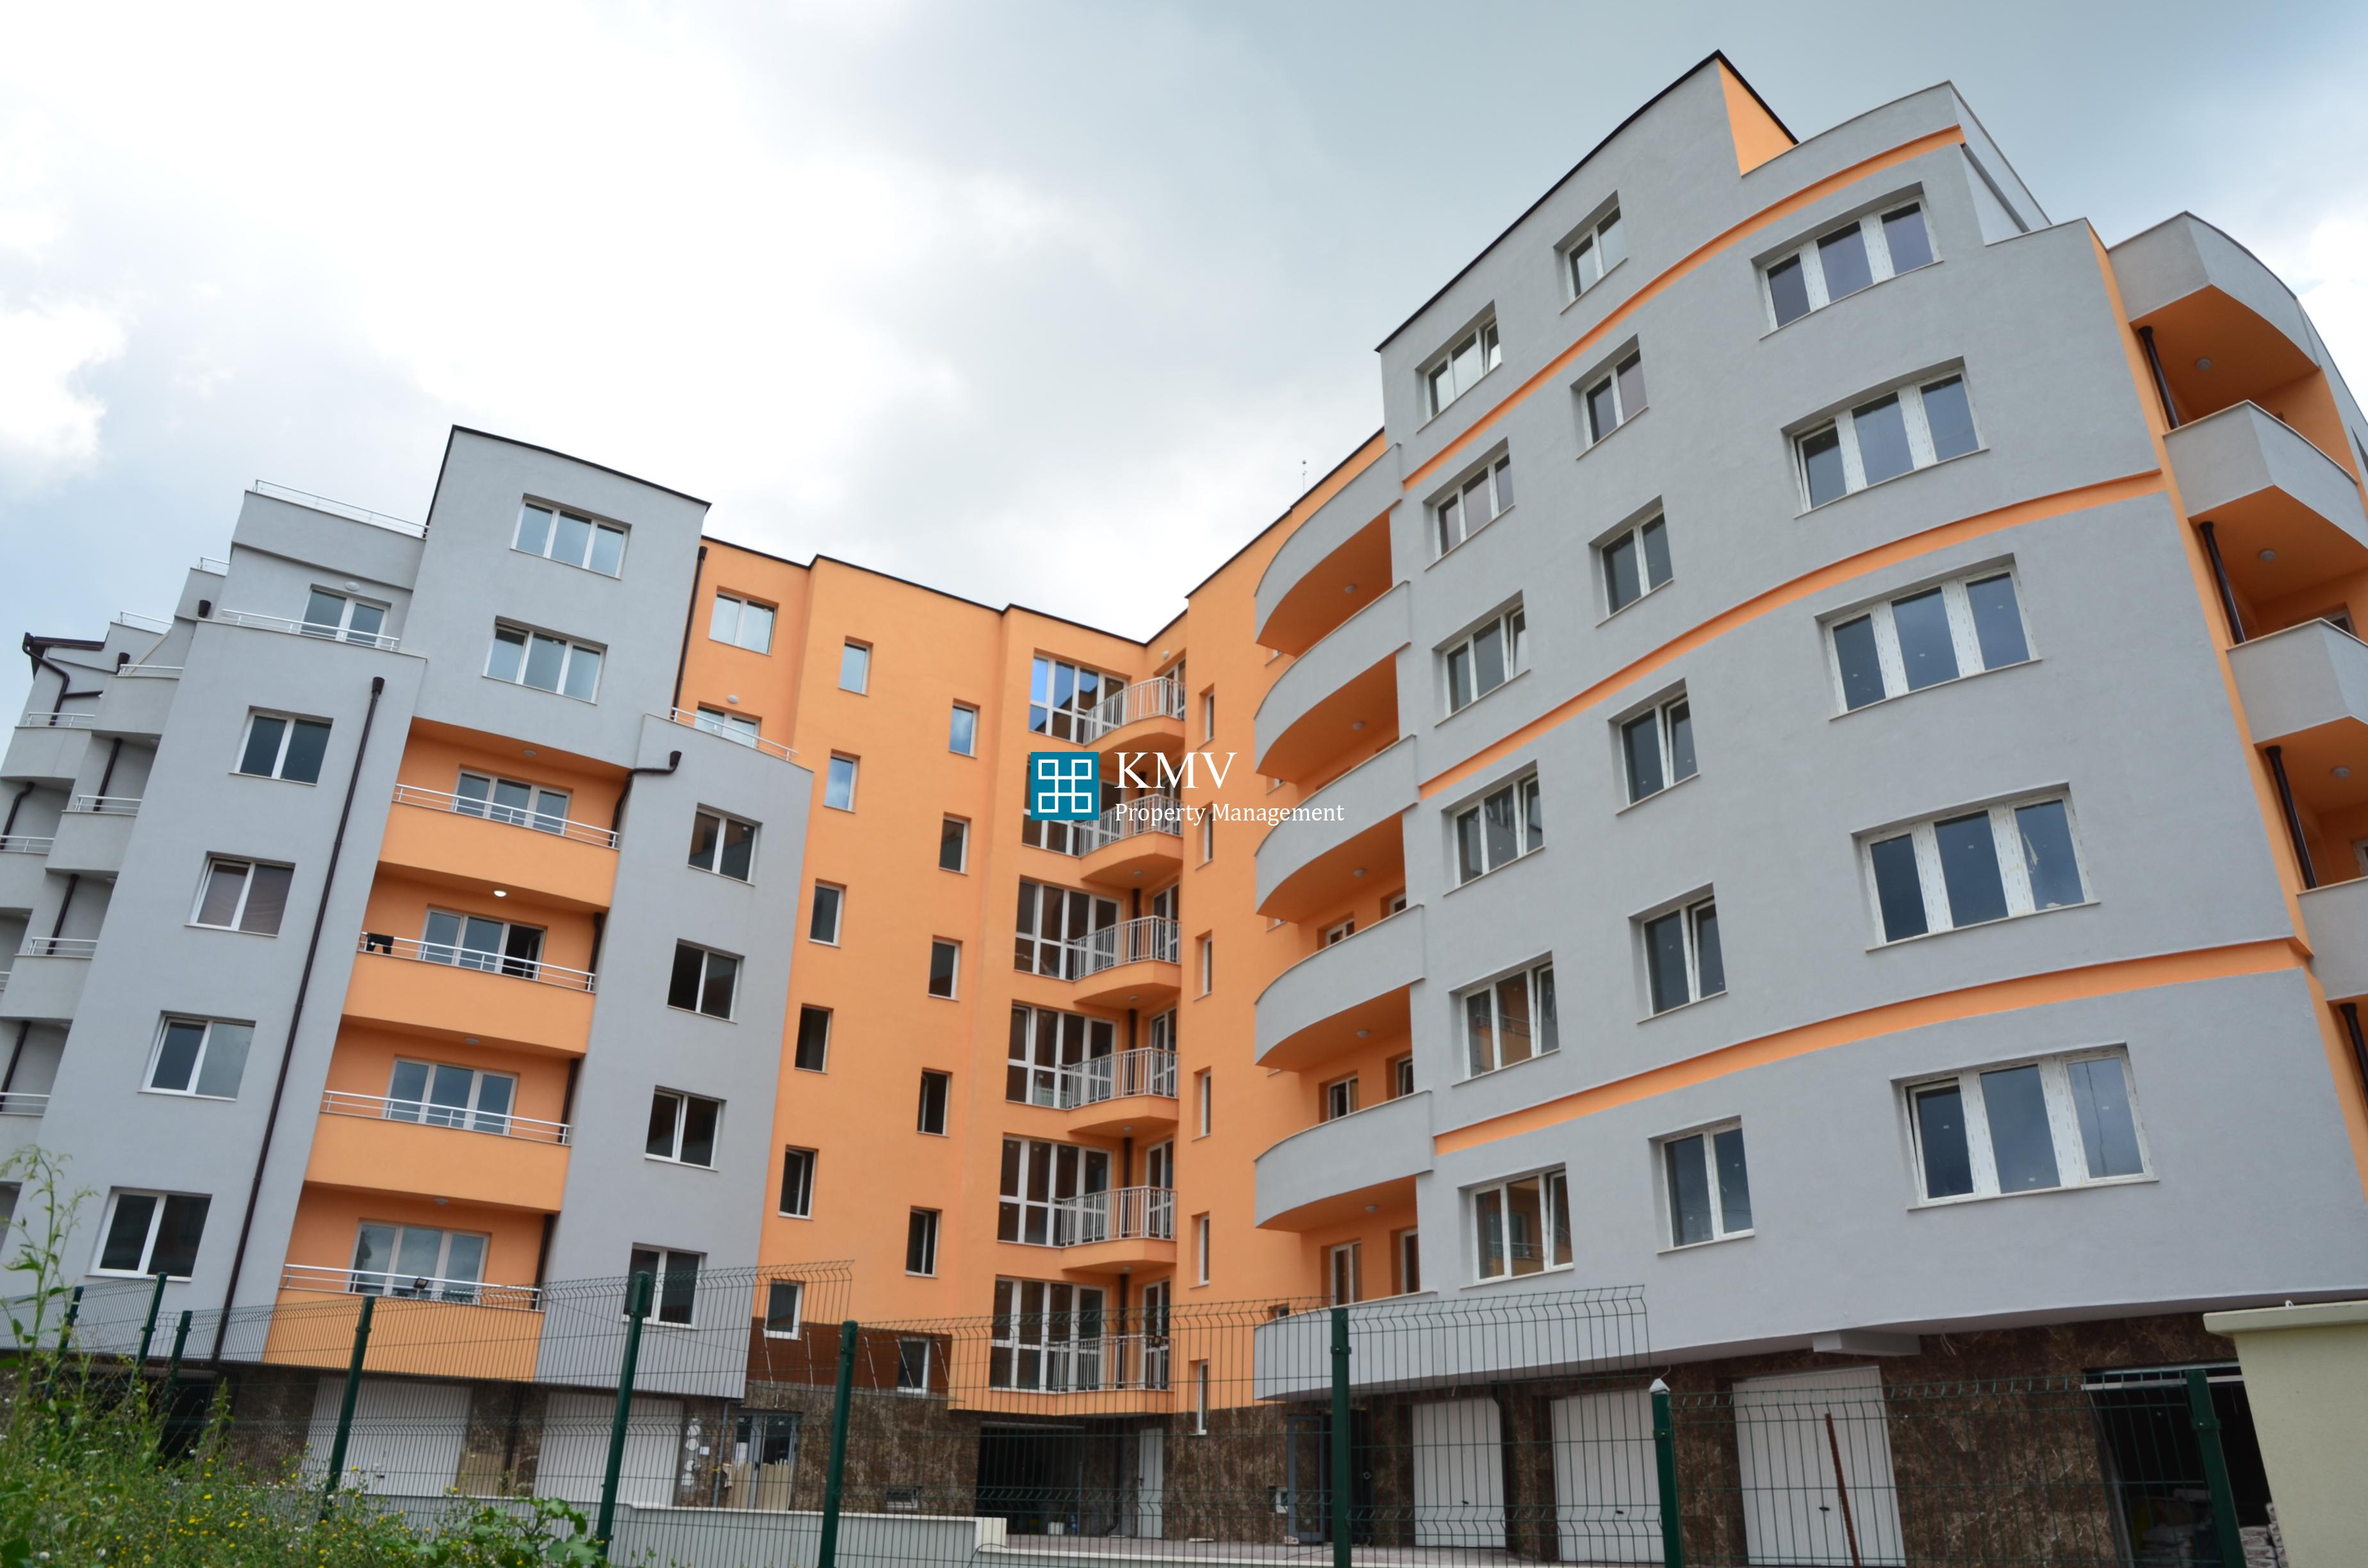 Тристаен апартамент за продажба в жилищна сграда в кв.Витоша – гр.София